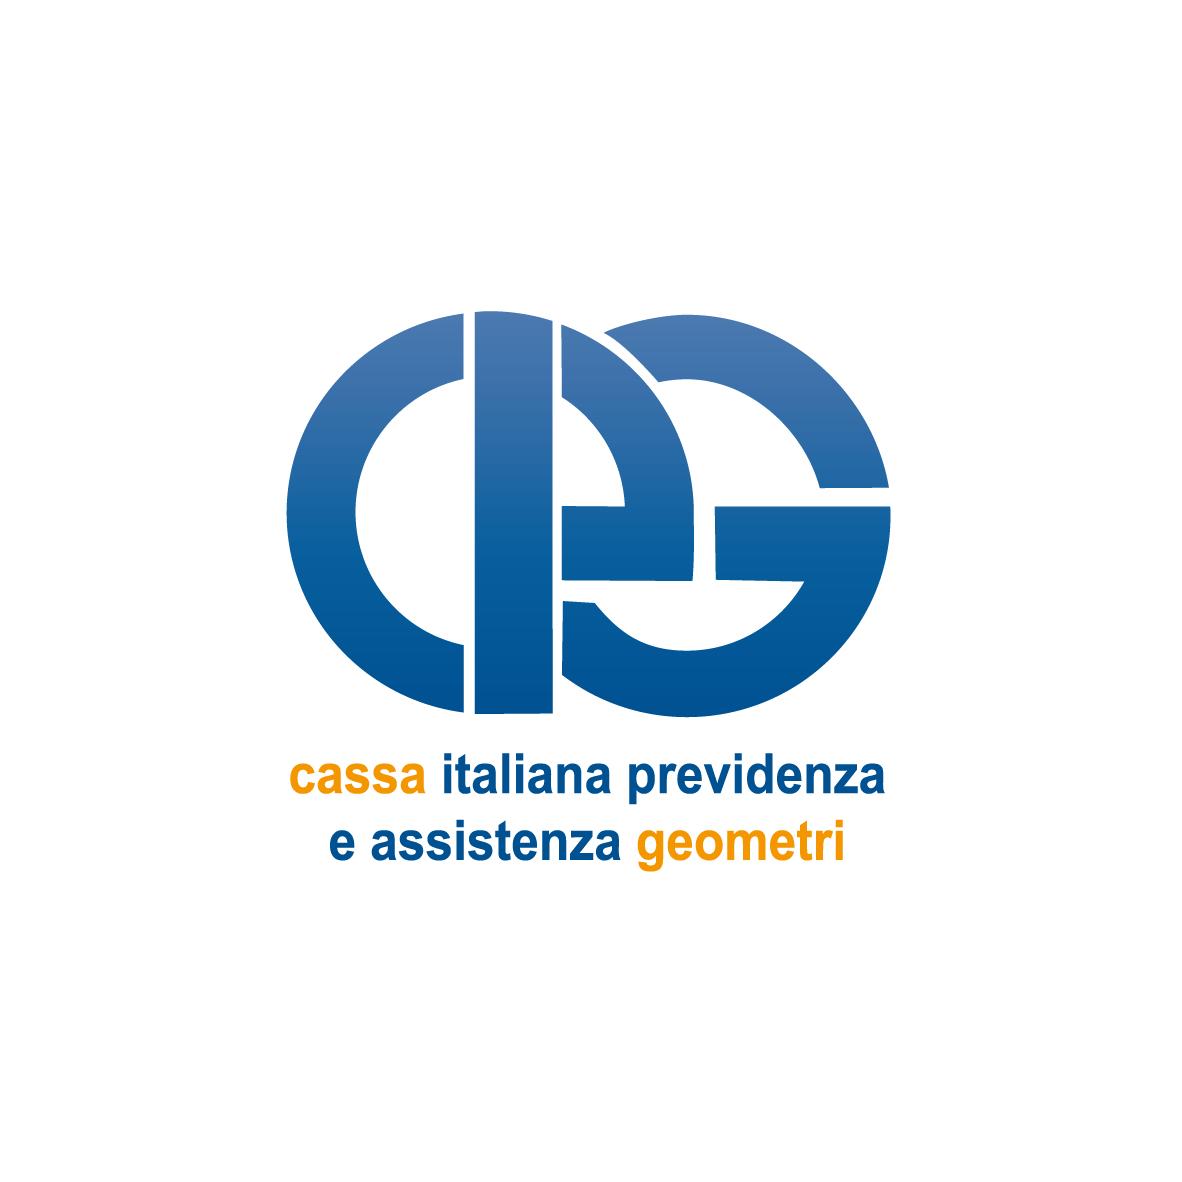 logo cassa geometri 2011-01